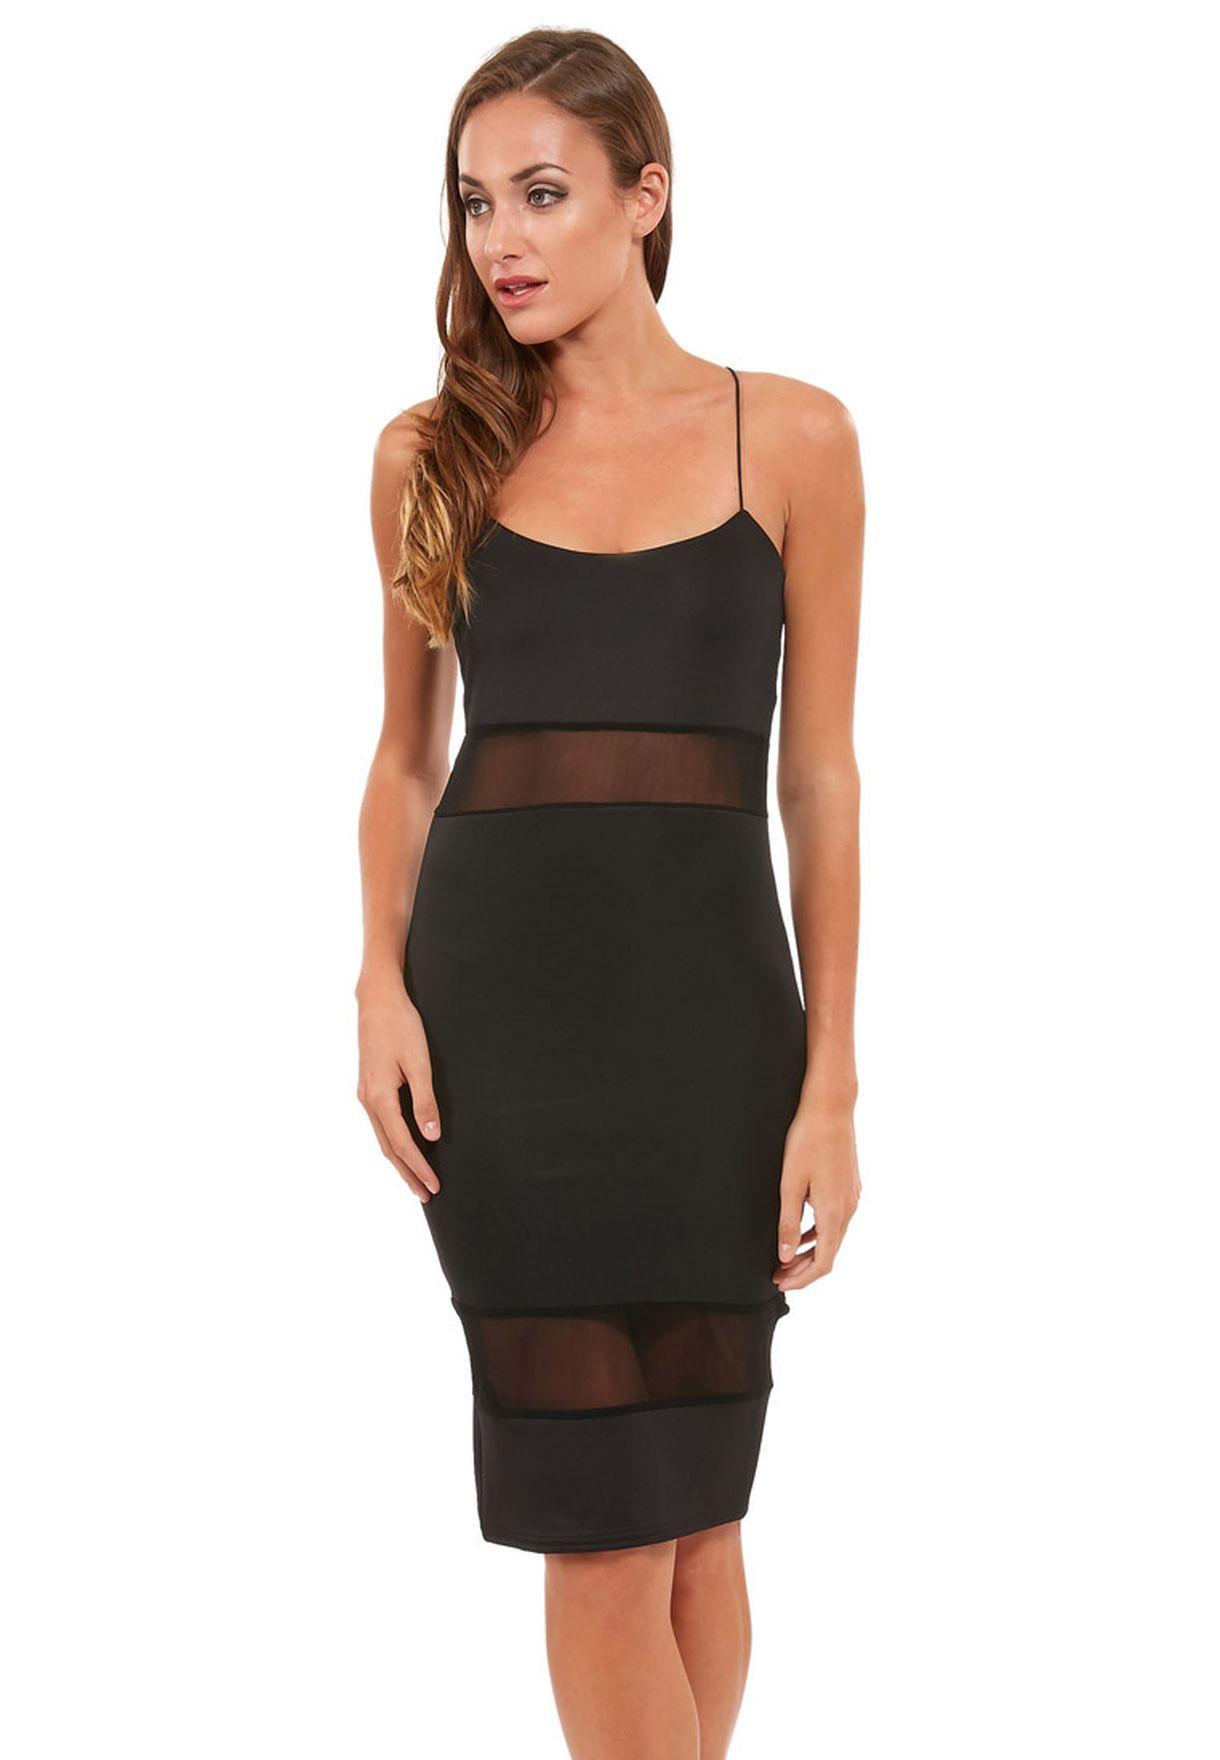 b5cd942ebf Shop Ruby Q black Mesh Insert Dress for Women in Oman - RU428AT50VMN